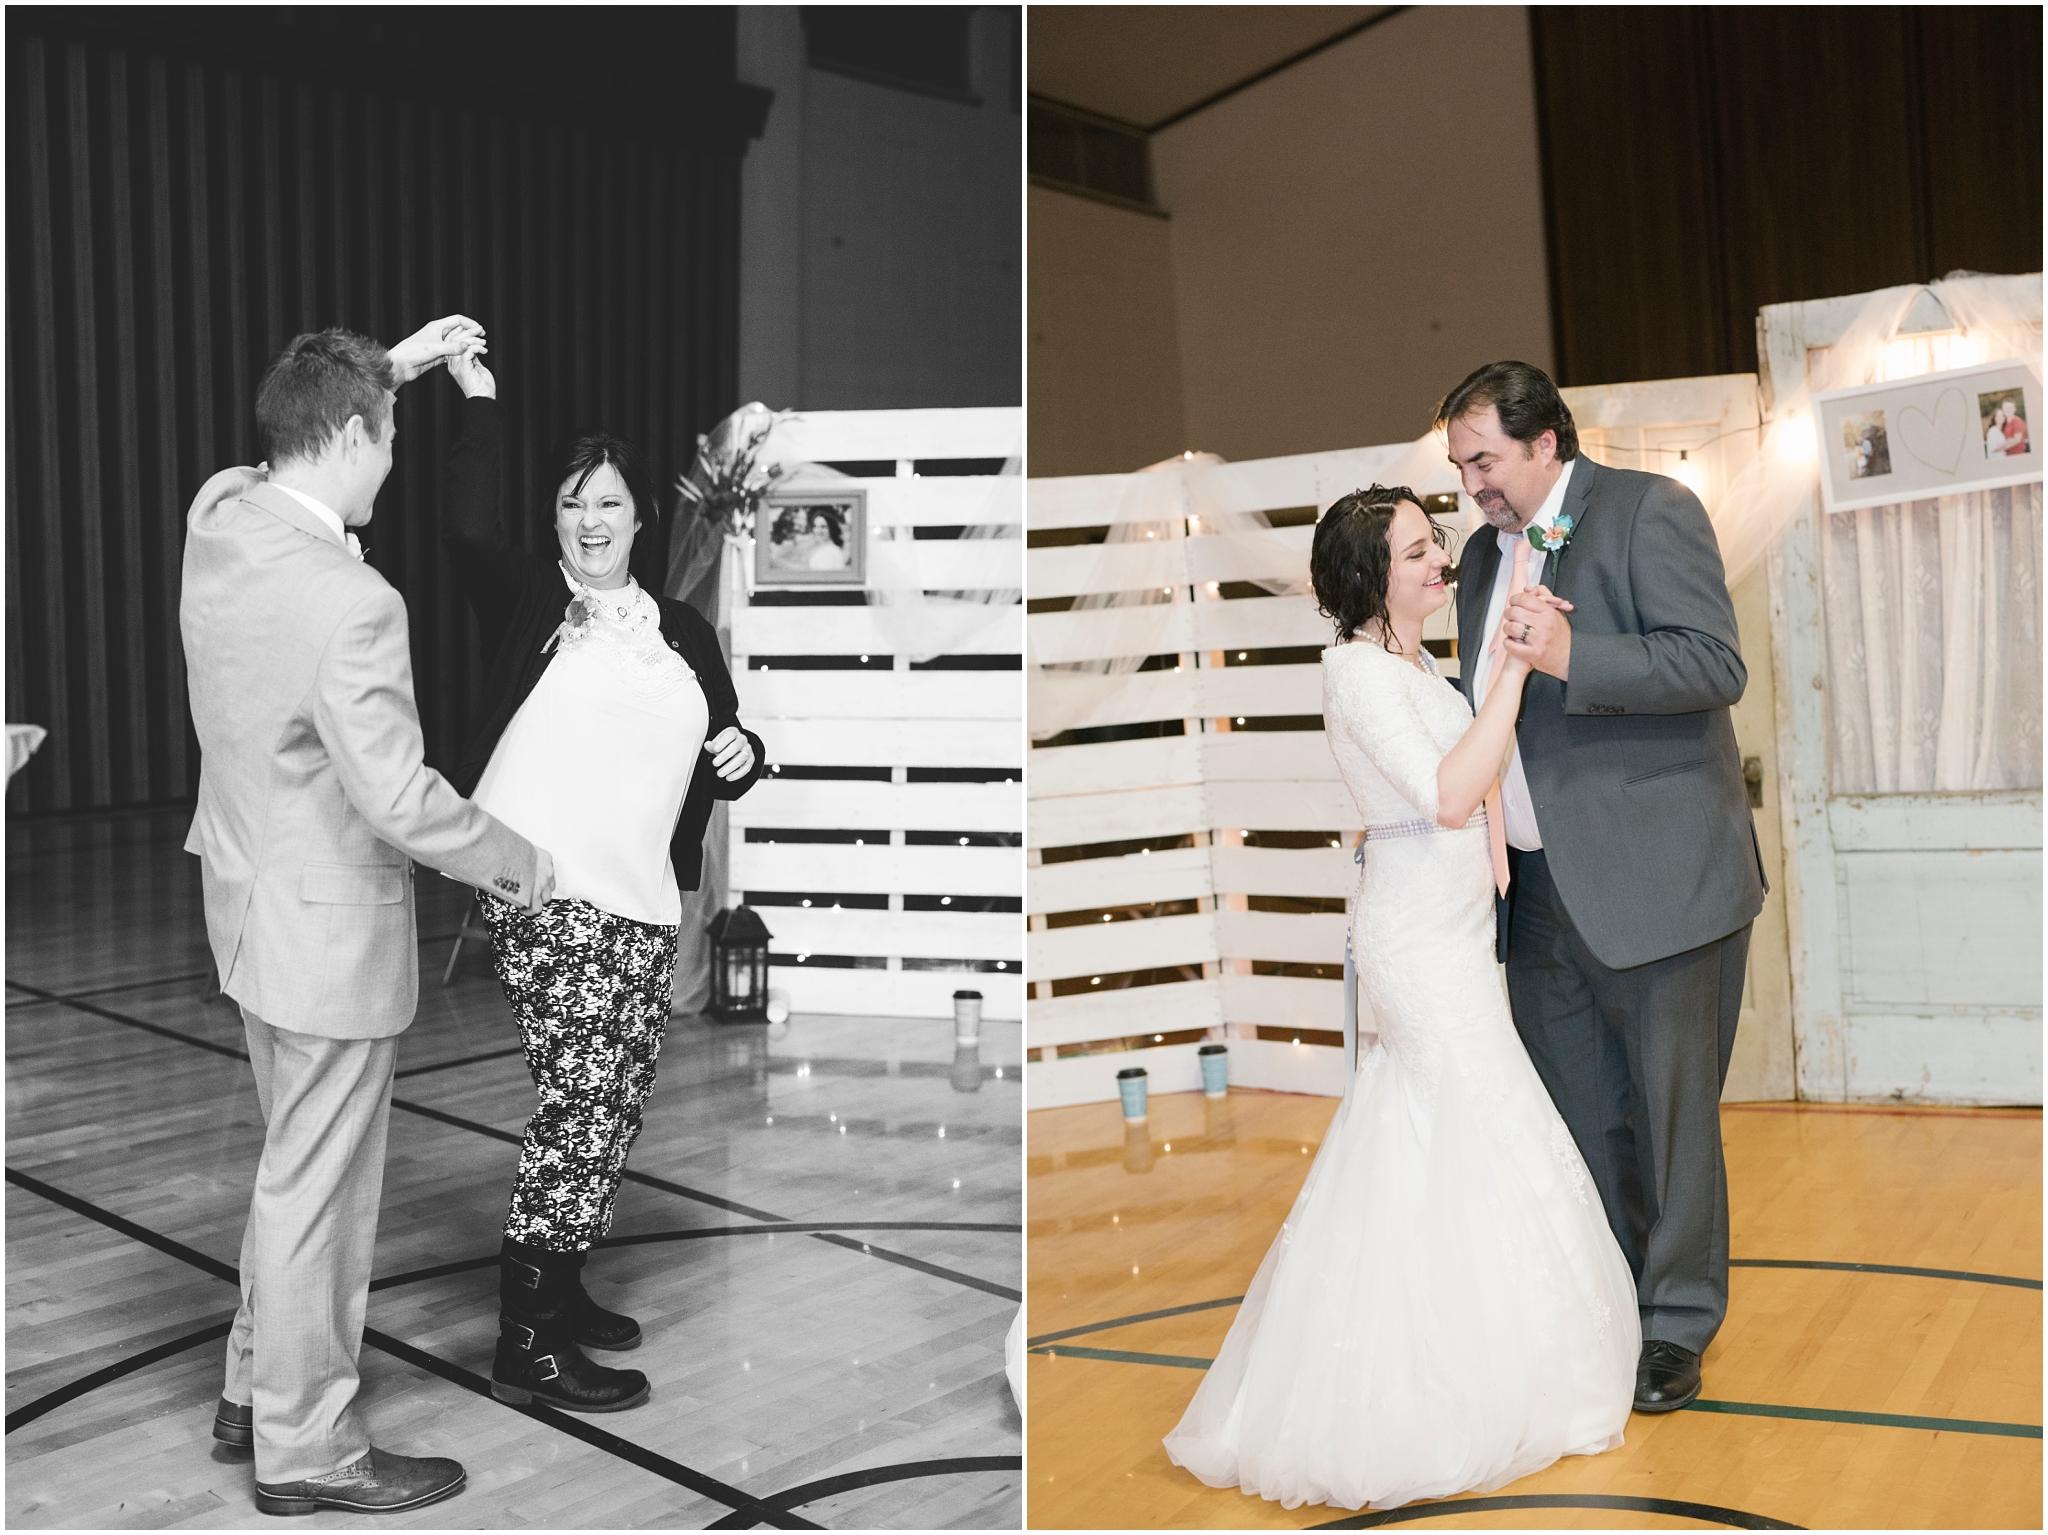 Bo Alyssa Wedding-519-BW_Lizzie-B-Imagery-Utah-Wedding-Photographer-Central-Utah-Photographer-Utah-County-Manti-Temple.jpg